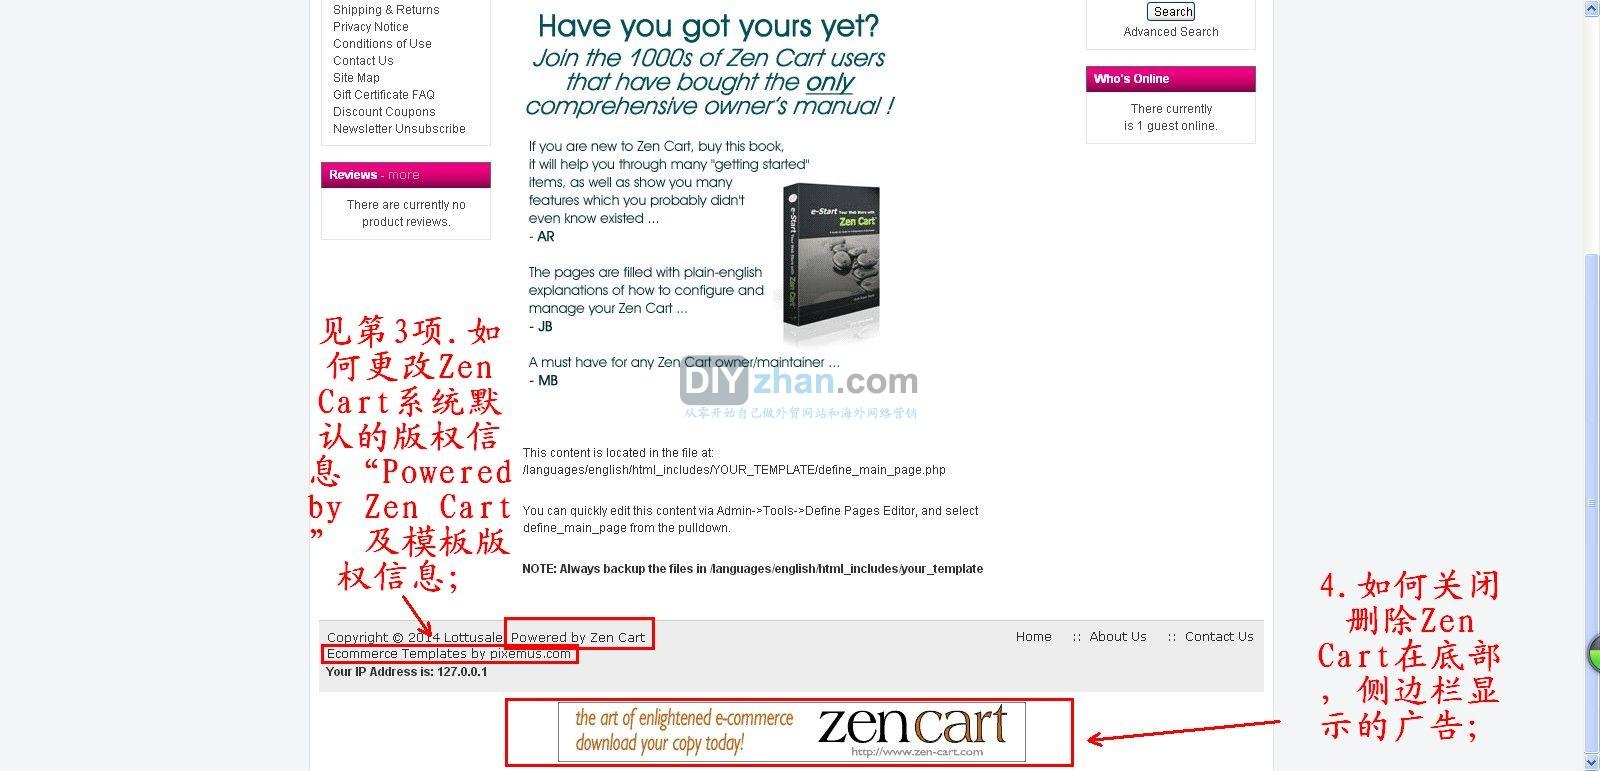 zencart_details_2